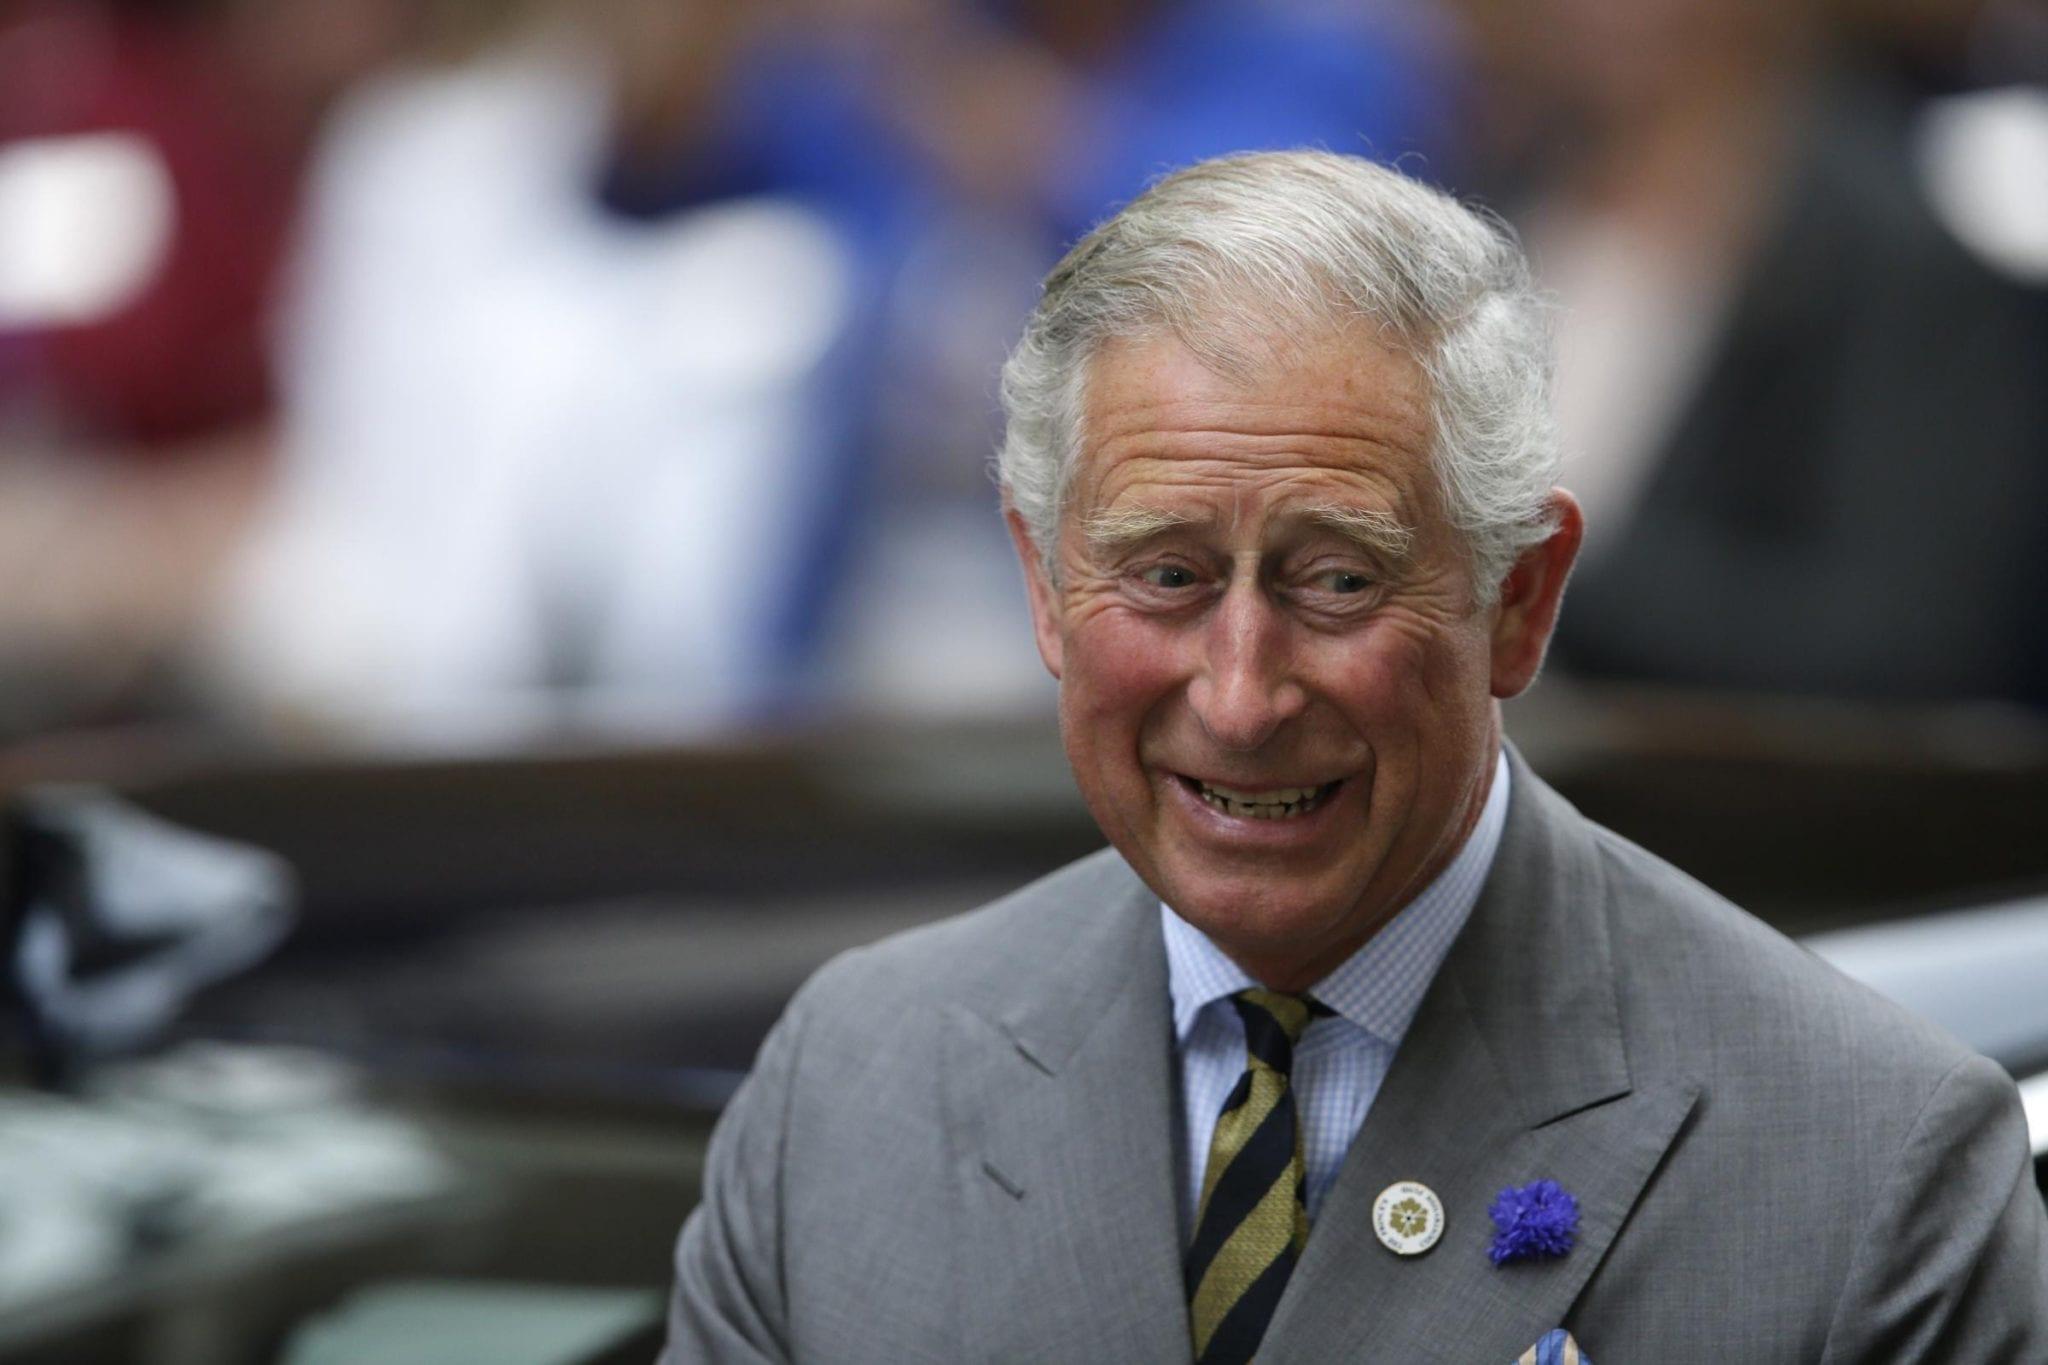 Carlo d'Inghilterra, sua altezza non vuole andare a Buckingham Palace